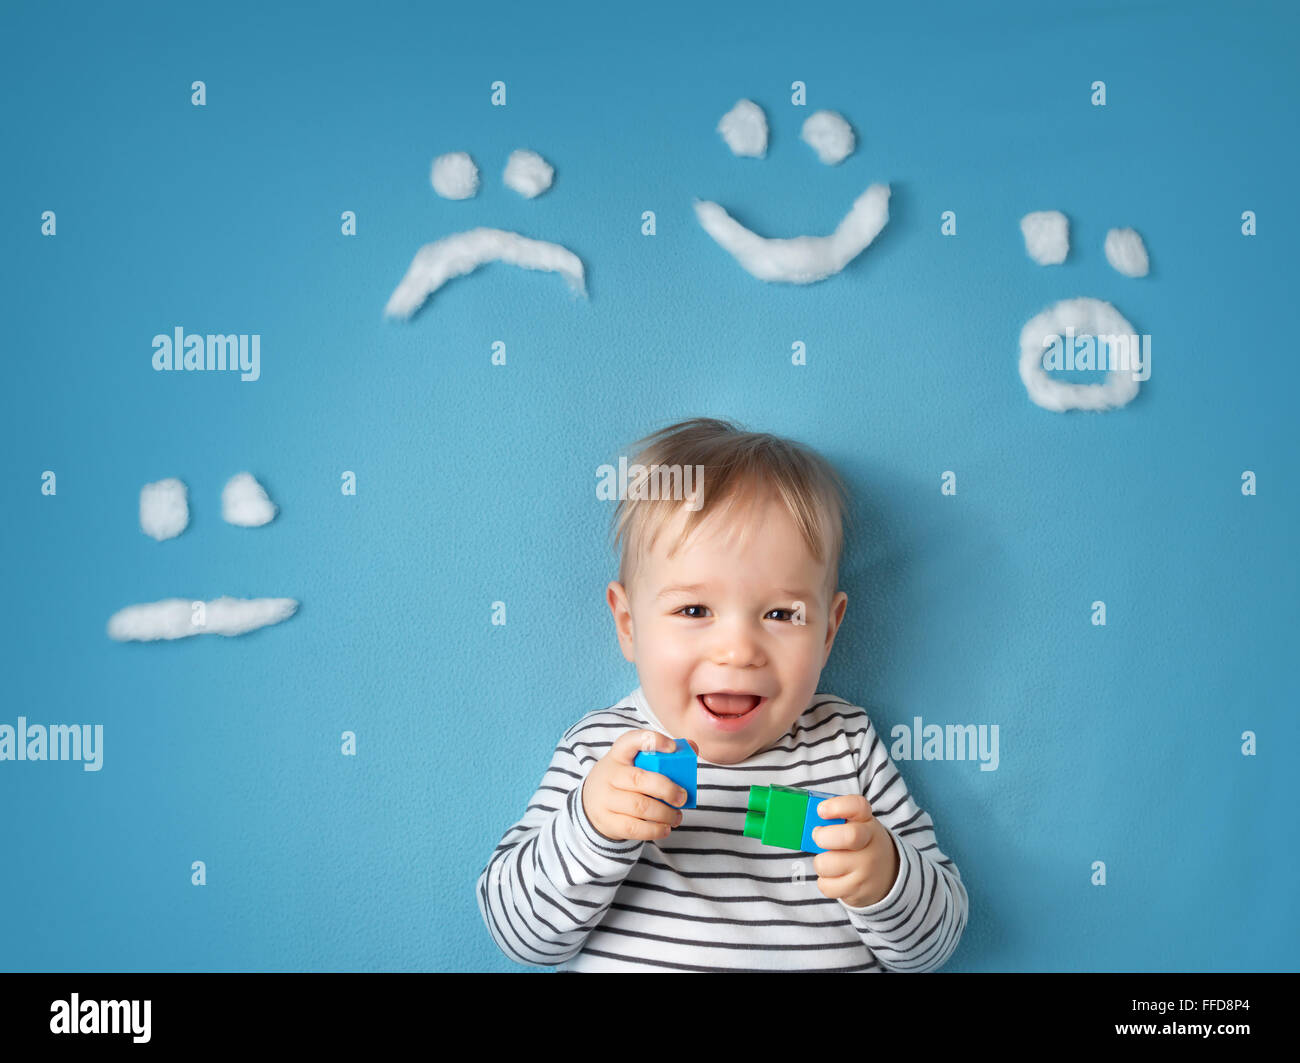 little boy on blue blanket background - Stock Image